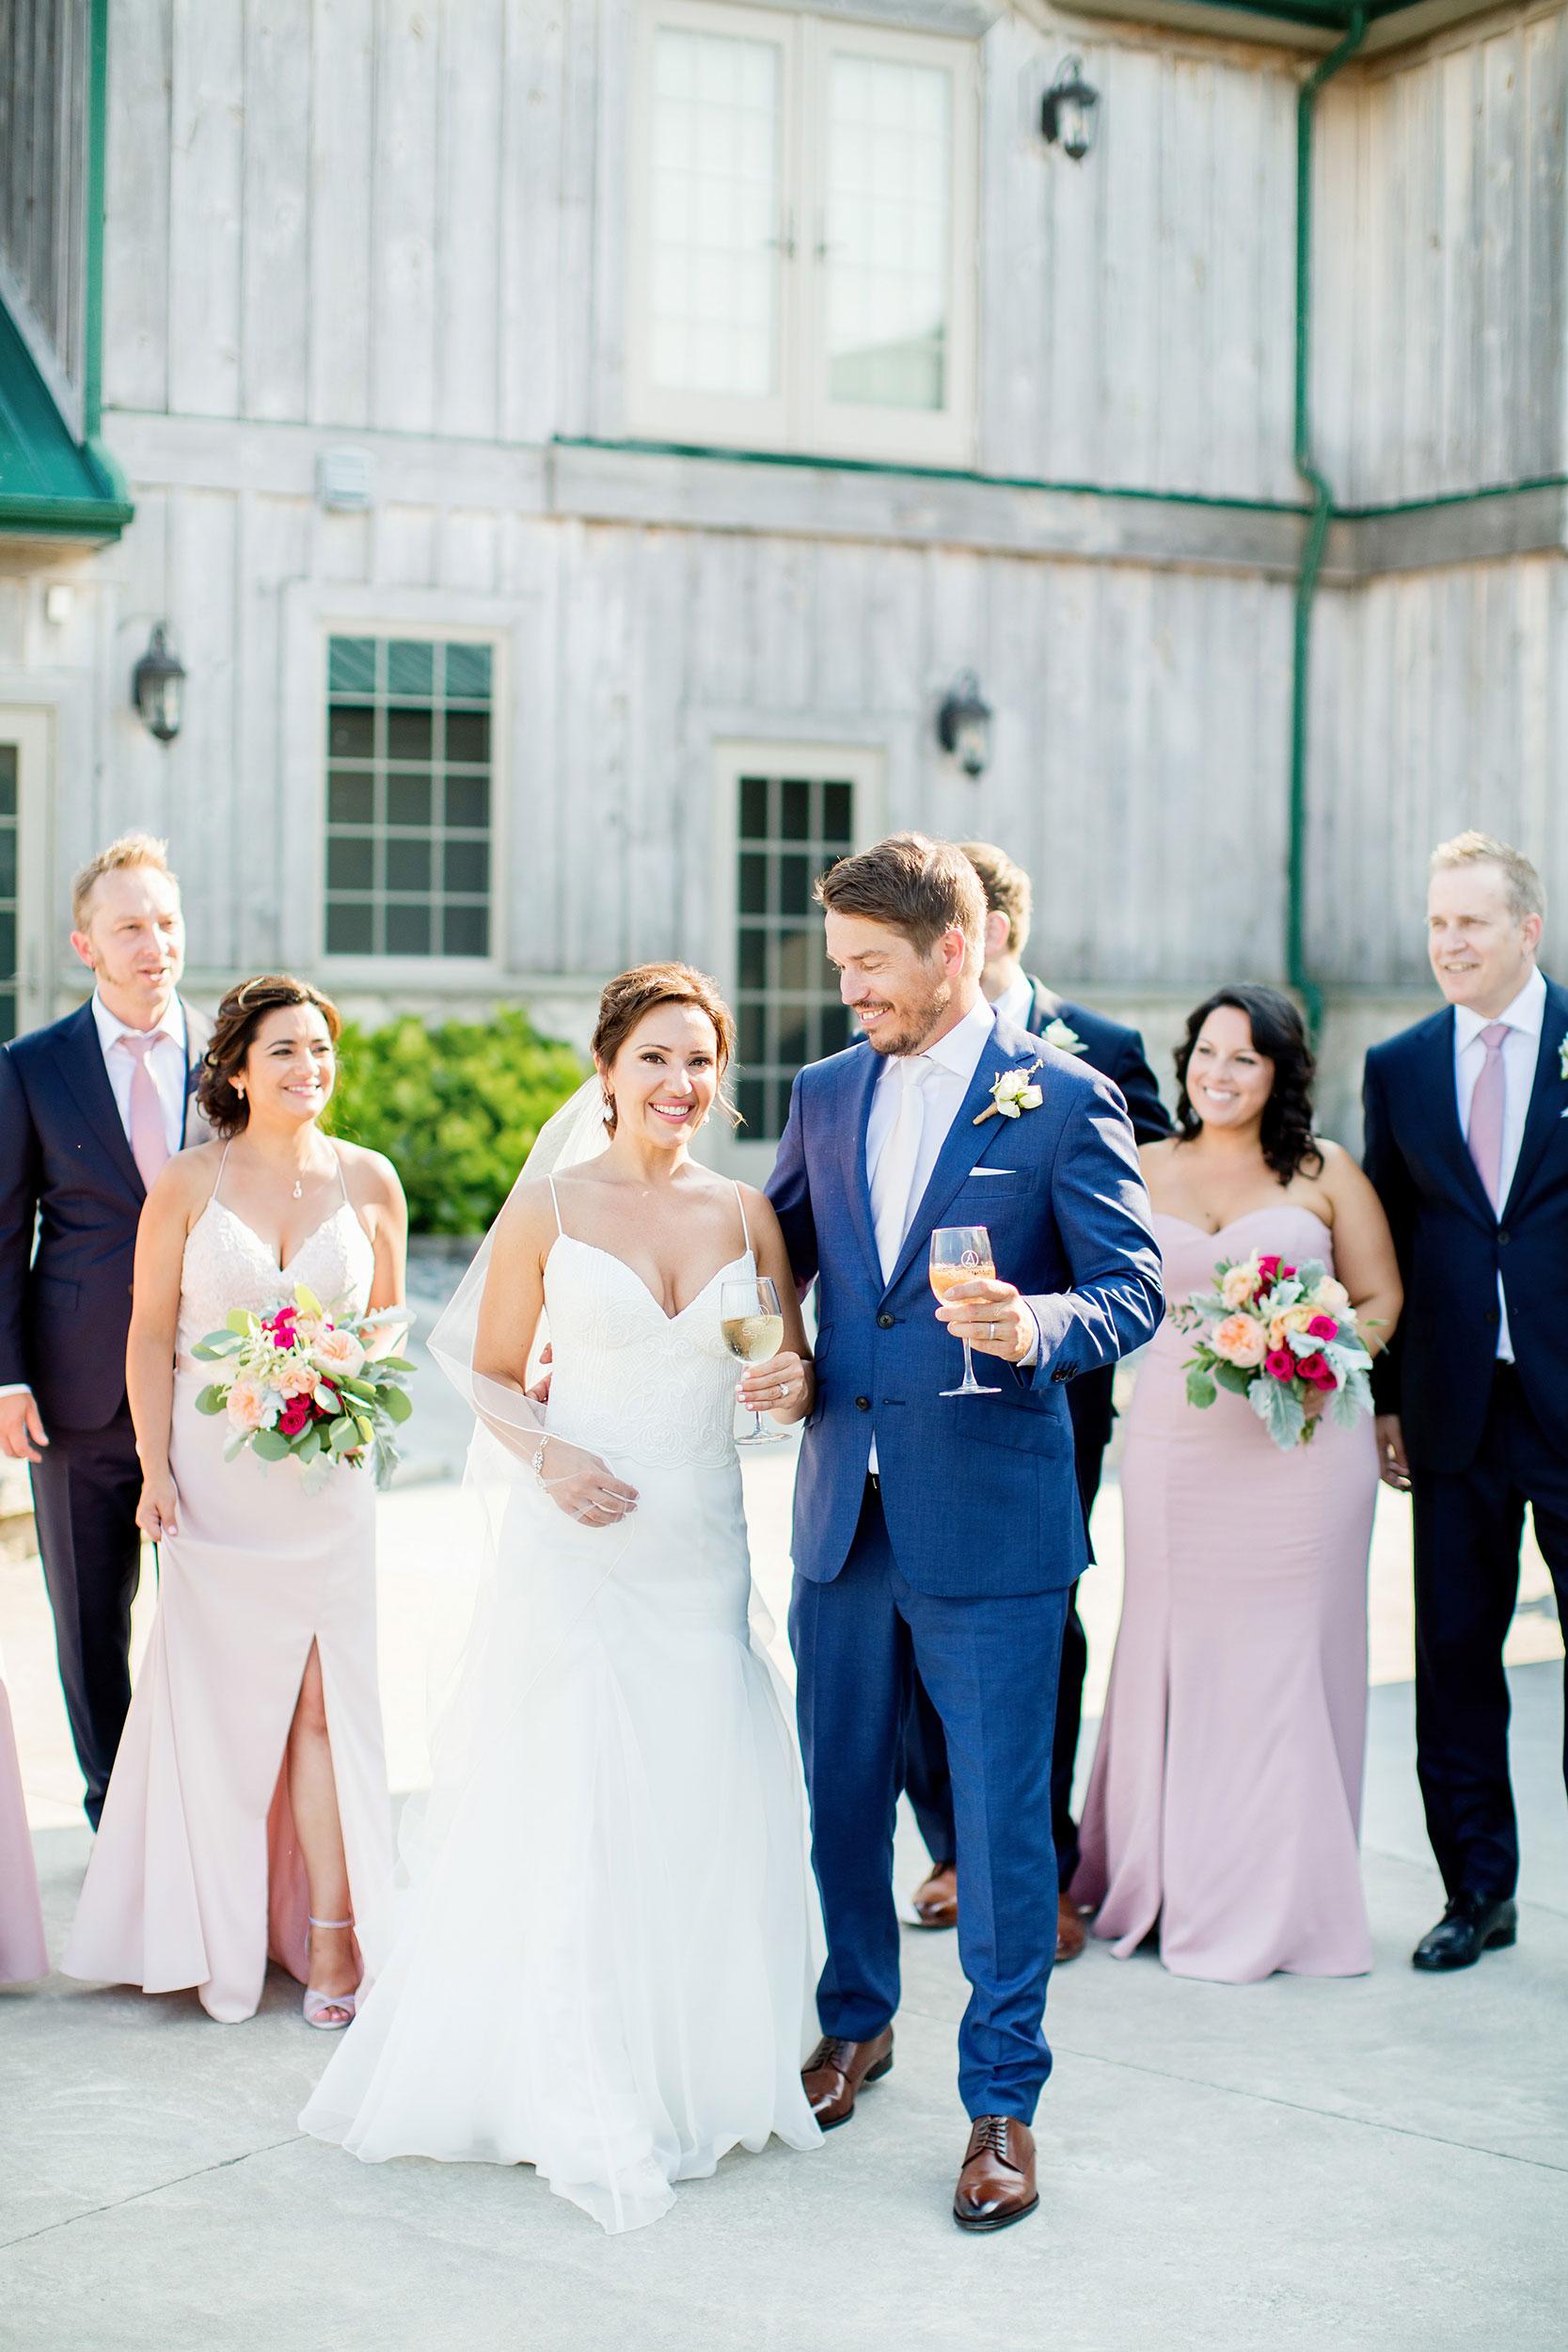 stylish-wedding-photography-windsor-toronto-ontario-wedding-photographer-sprucewood-winery-eryn-shea-photography-32.JPG